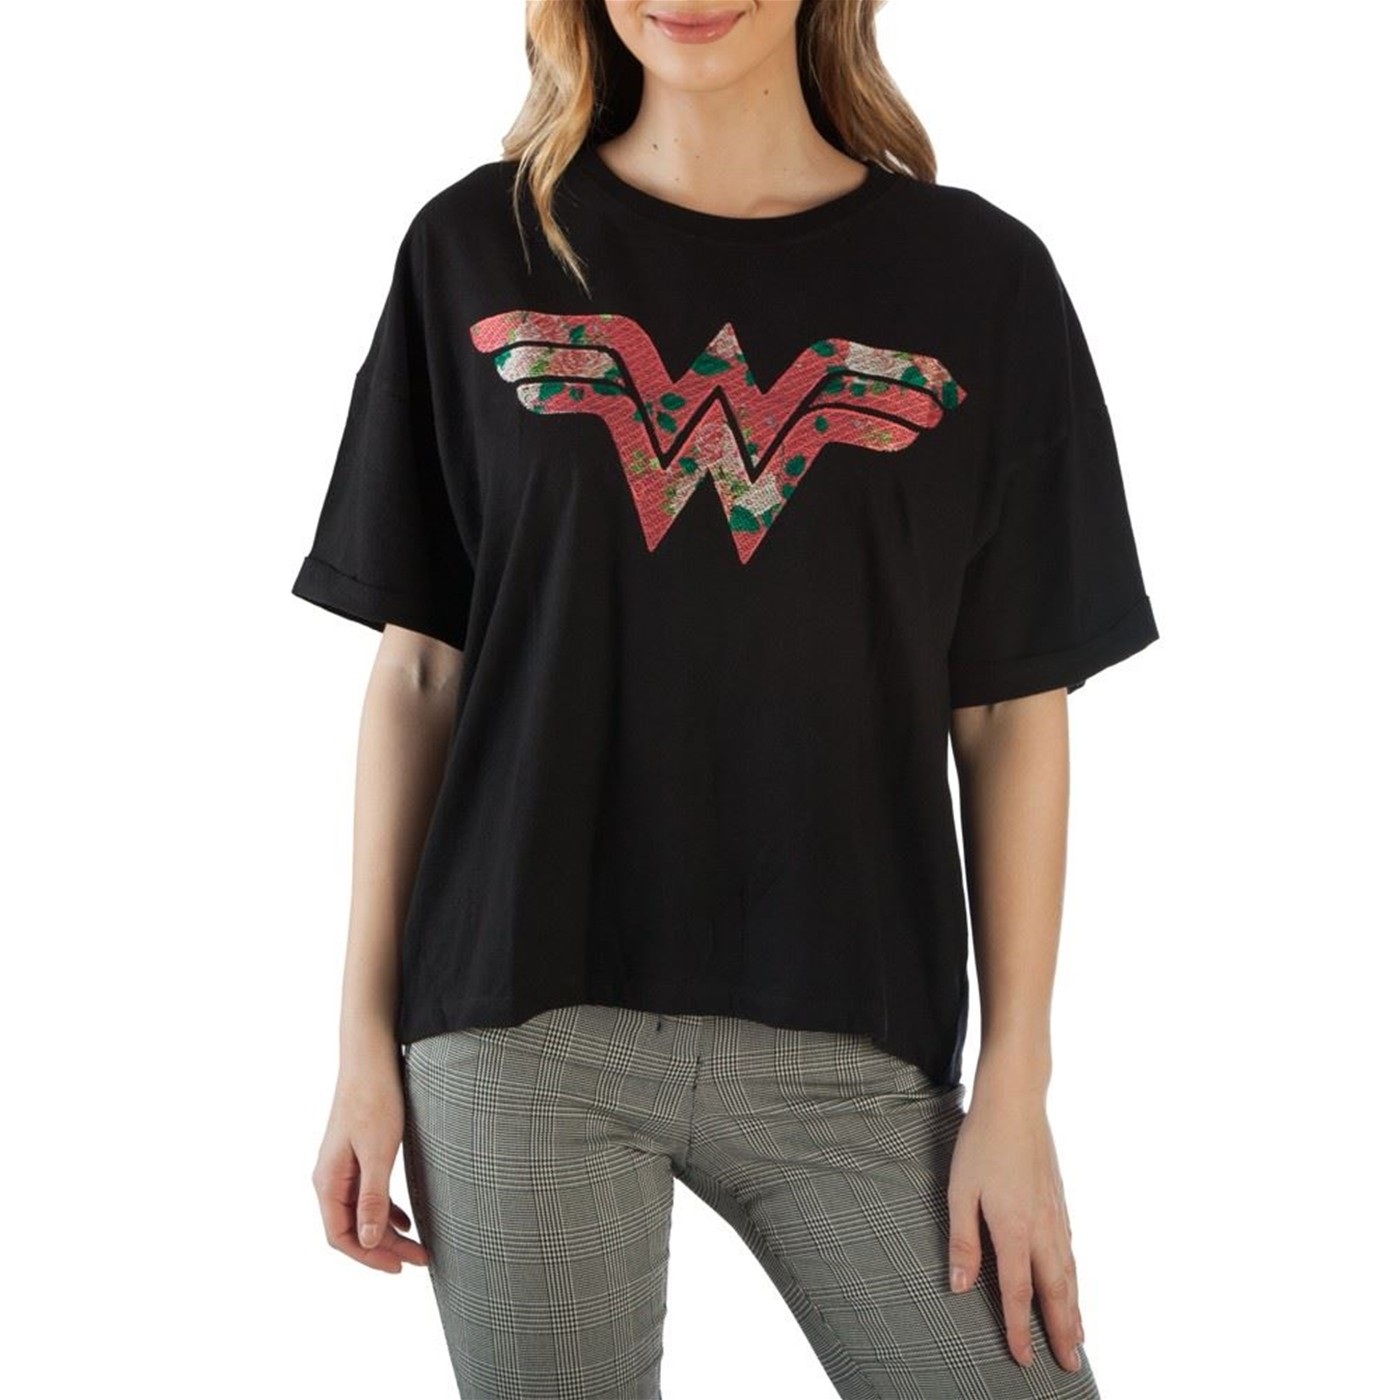 Wonder Woman Floral Symbol Women's T-Shirt